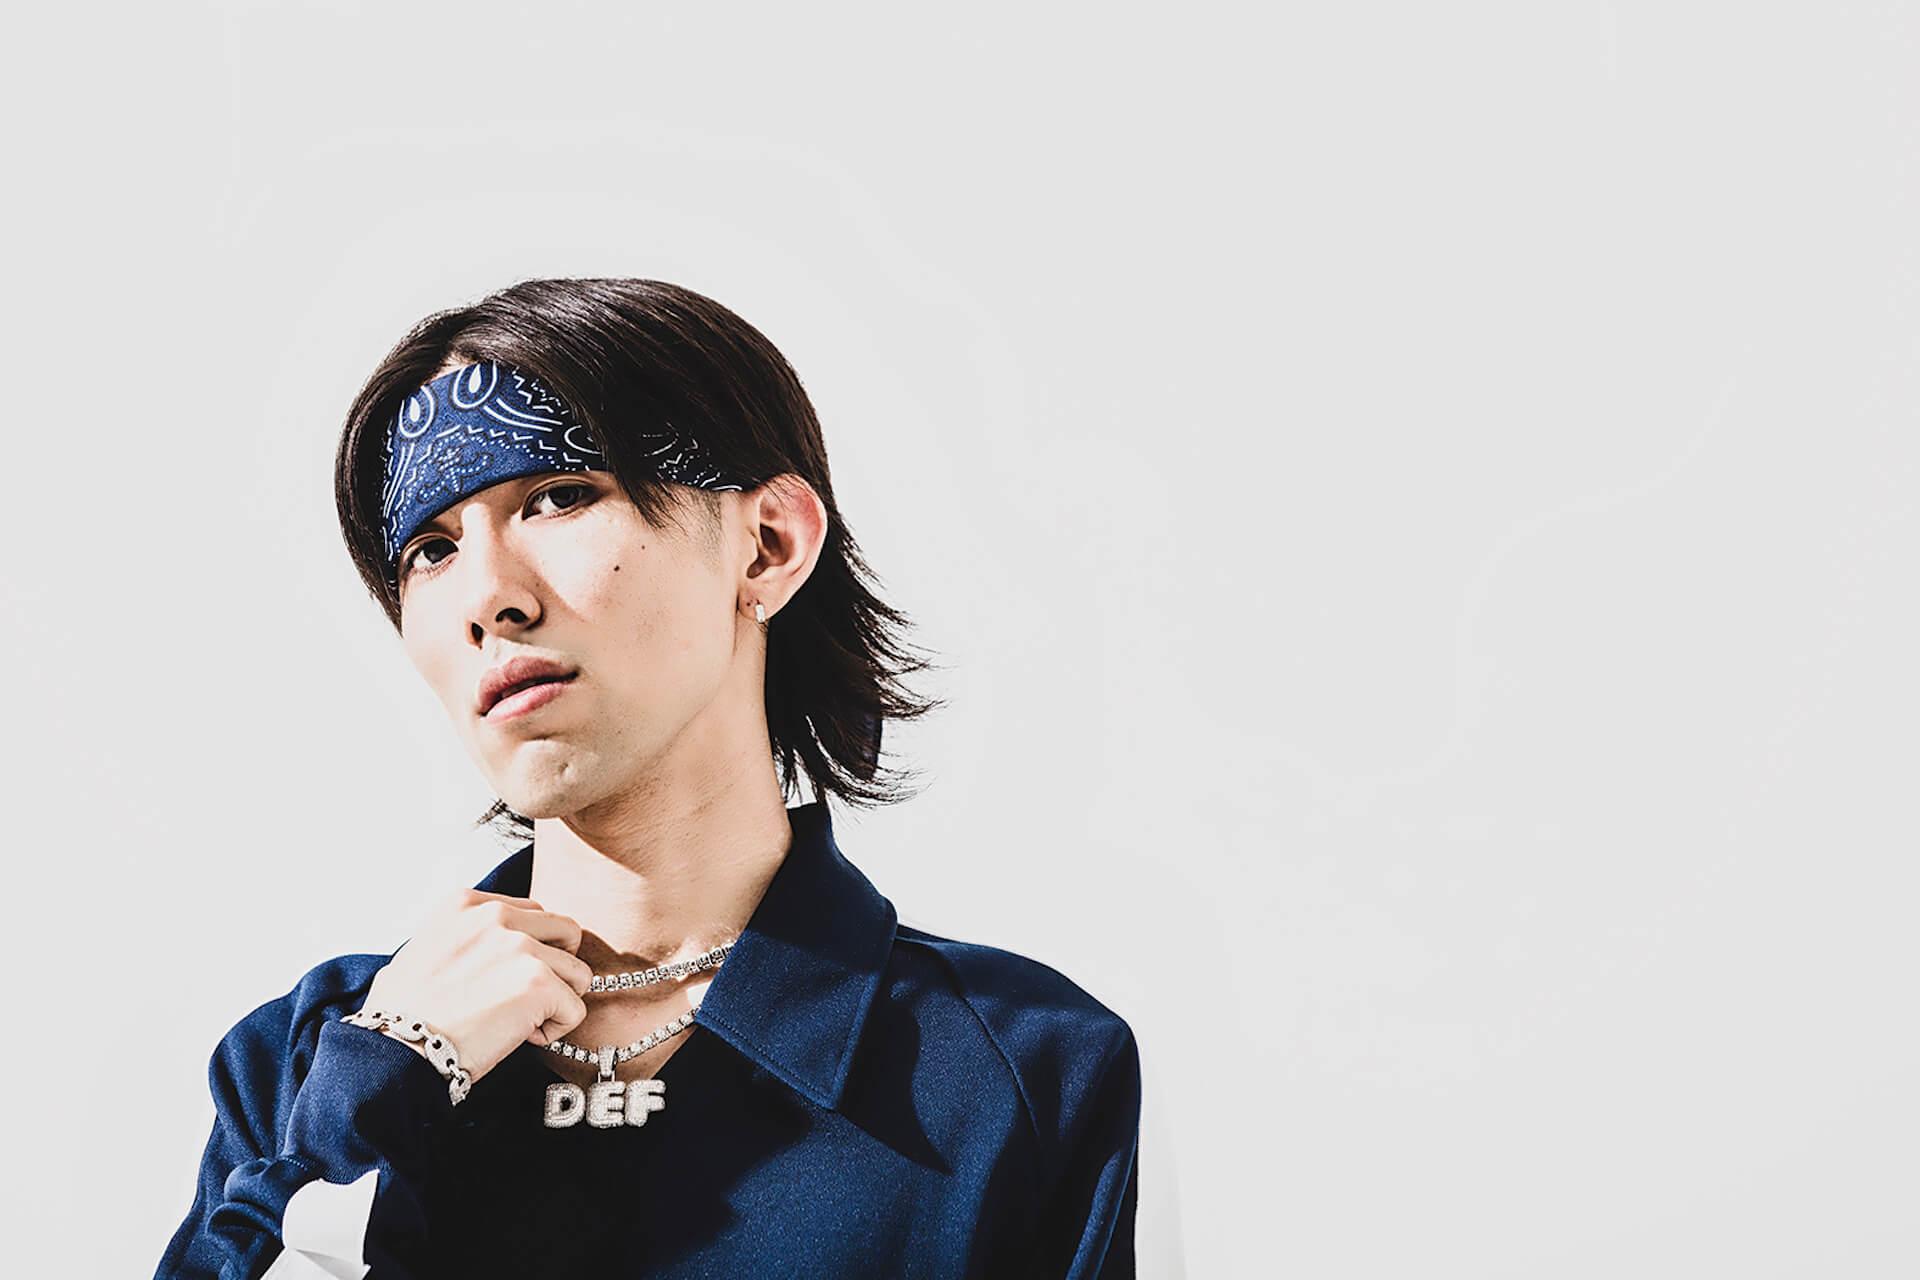 RAU DEF、ニューアルバム『ESCALATE III』を9月25日に発売決定|SKY-HI、PUNPEE、JNKMN、kamuiらが客演 music190821-raudef-1